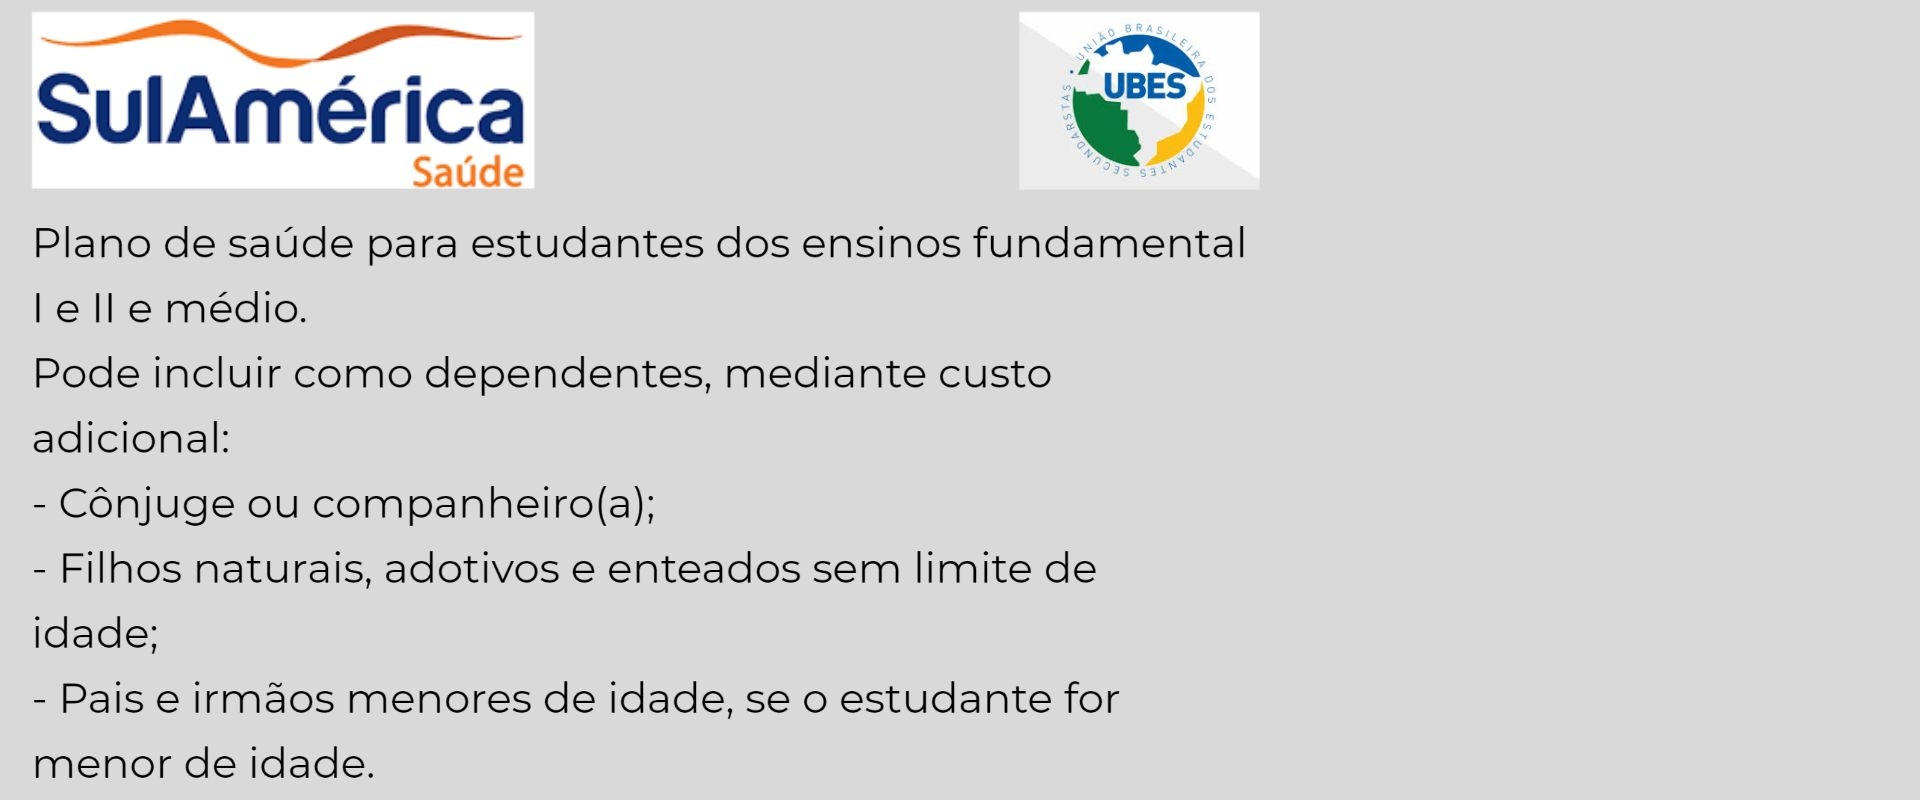 Sul América UBES-PB